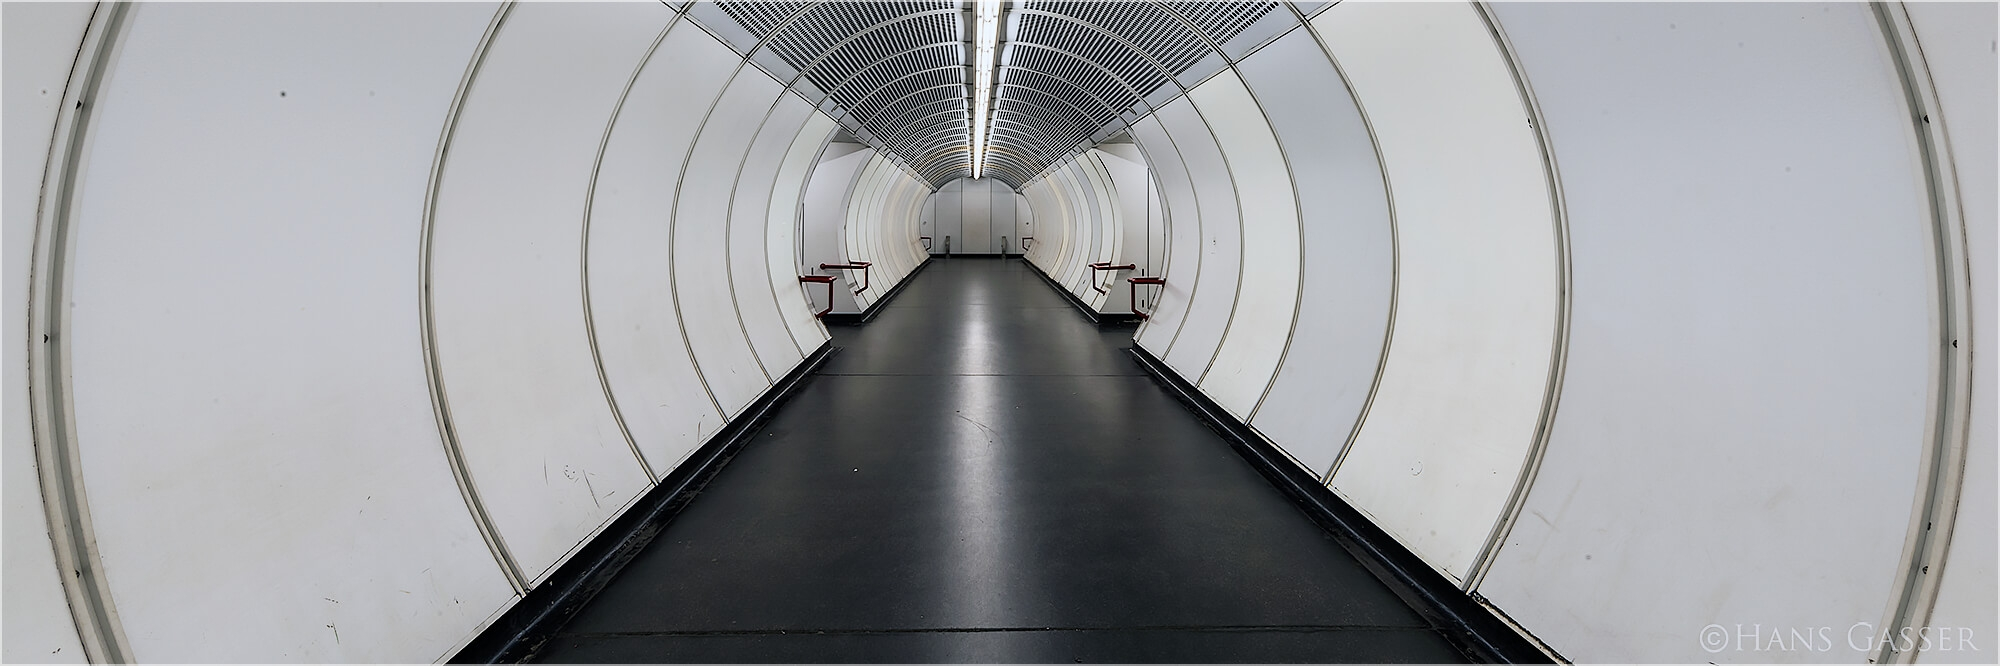 Panoramabild Wiener U-Bahn Station